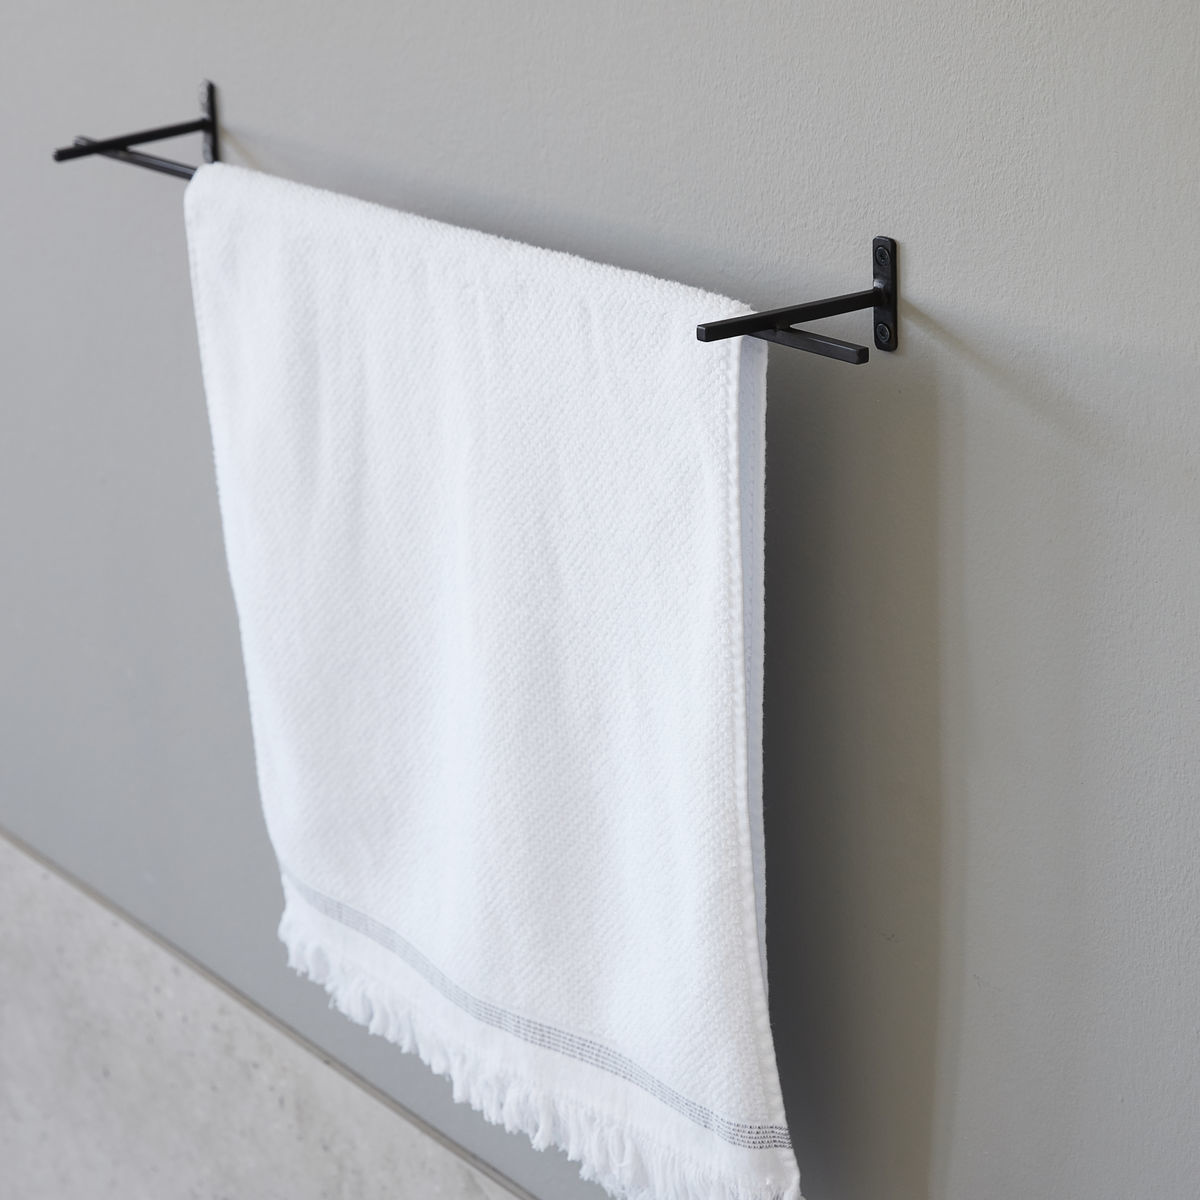 House Doctor metal kitchen bar, towel bar, Add, black